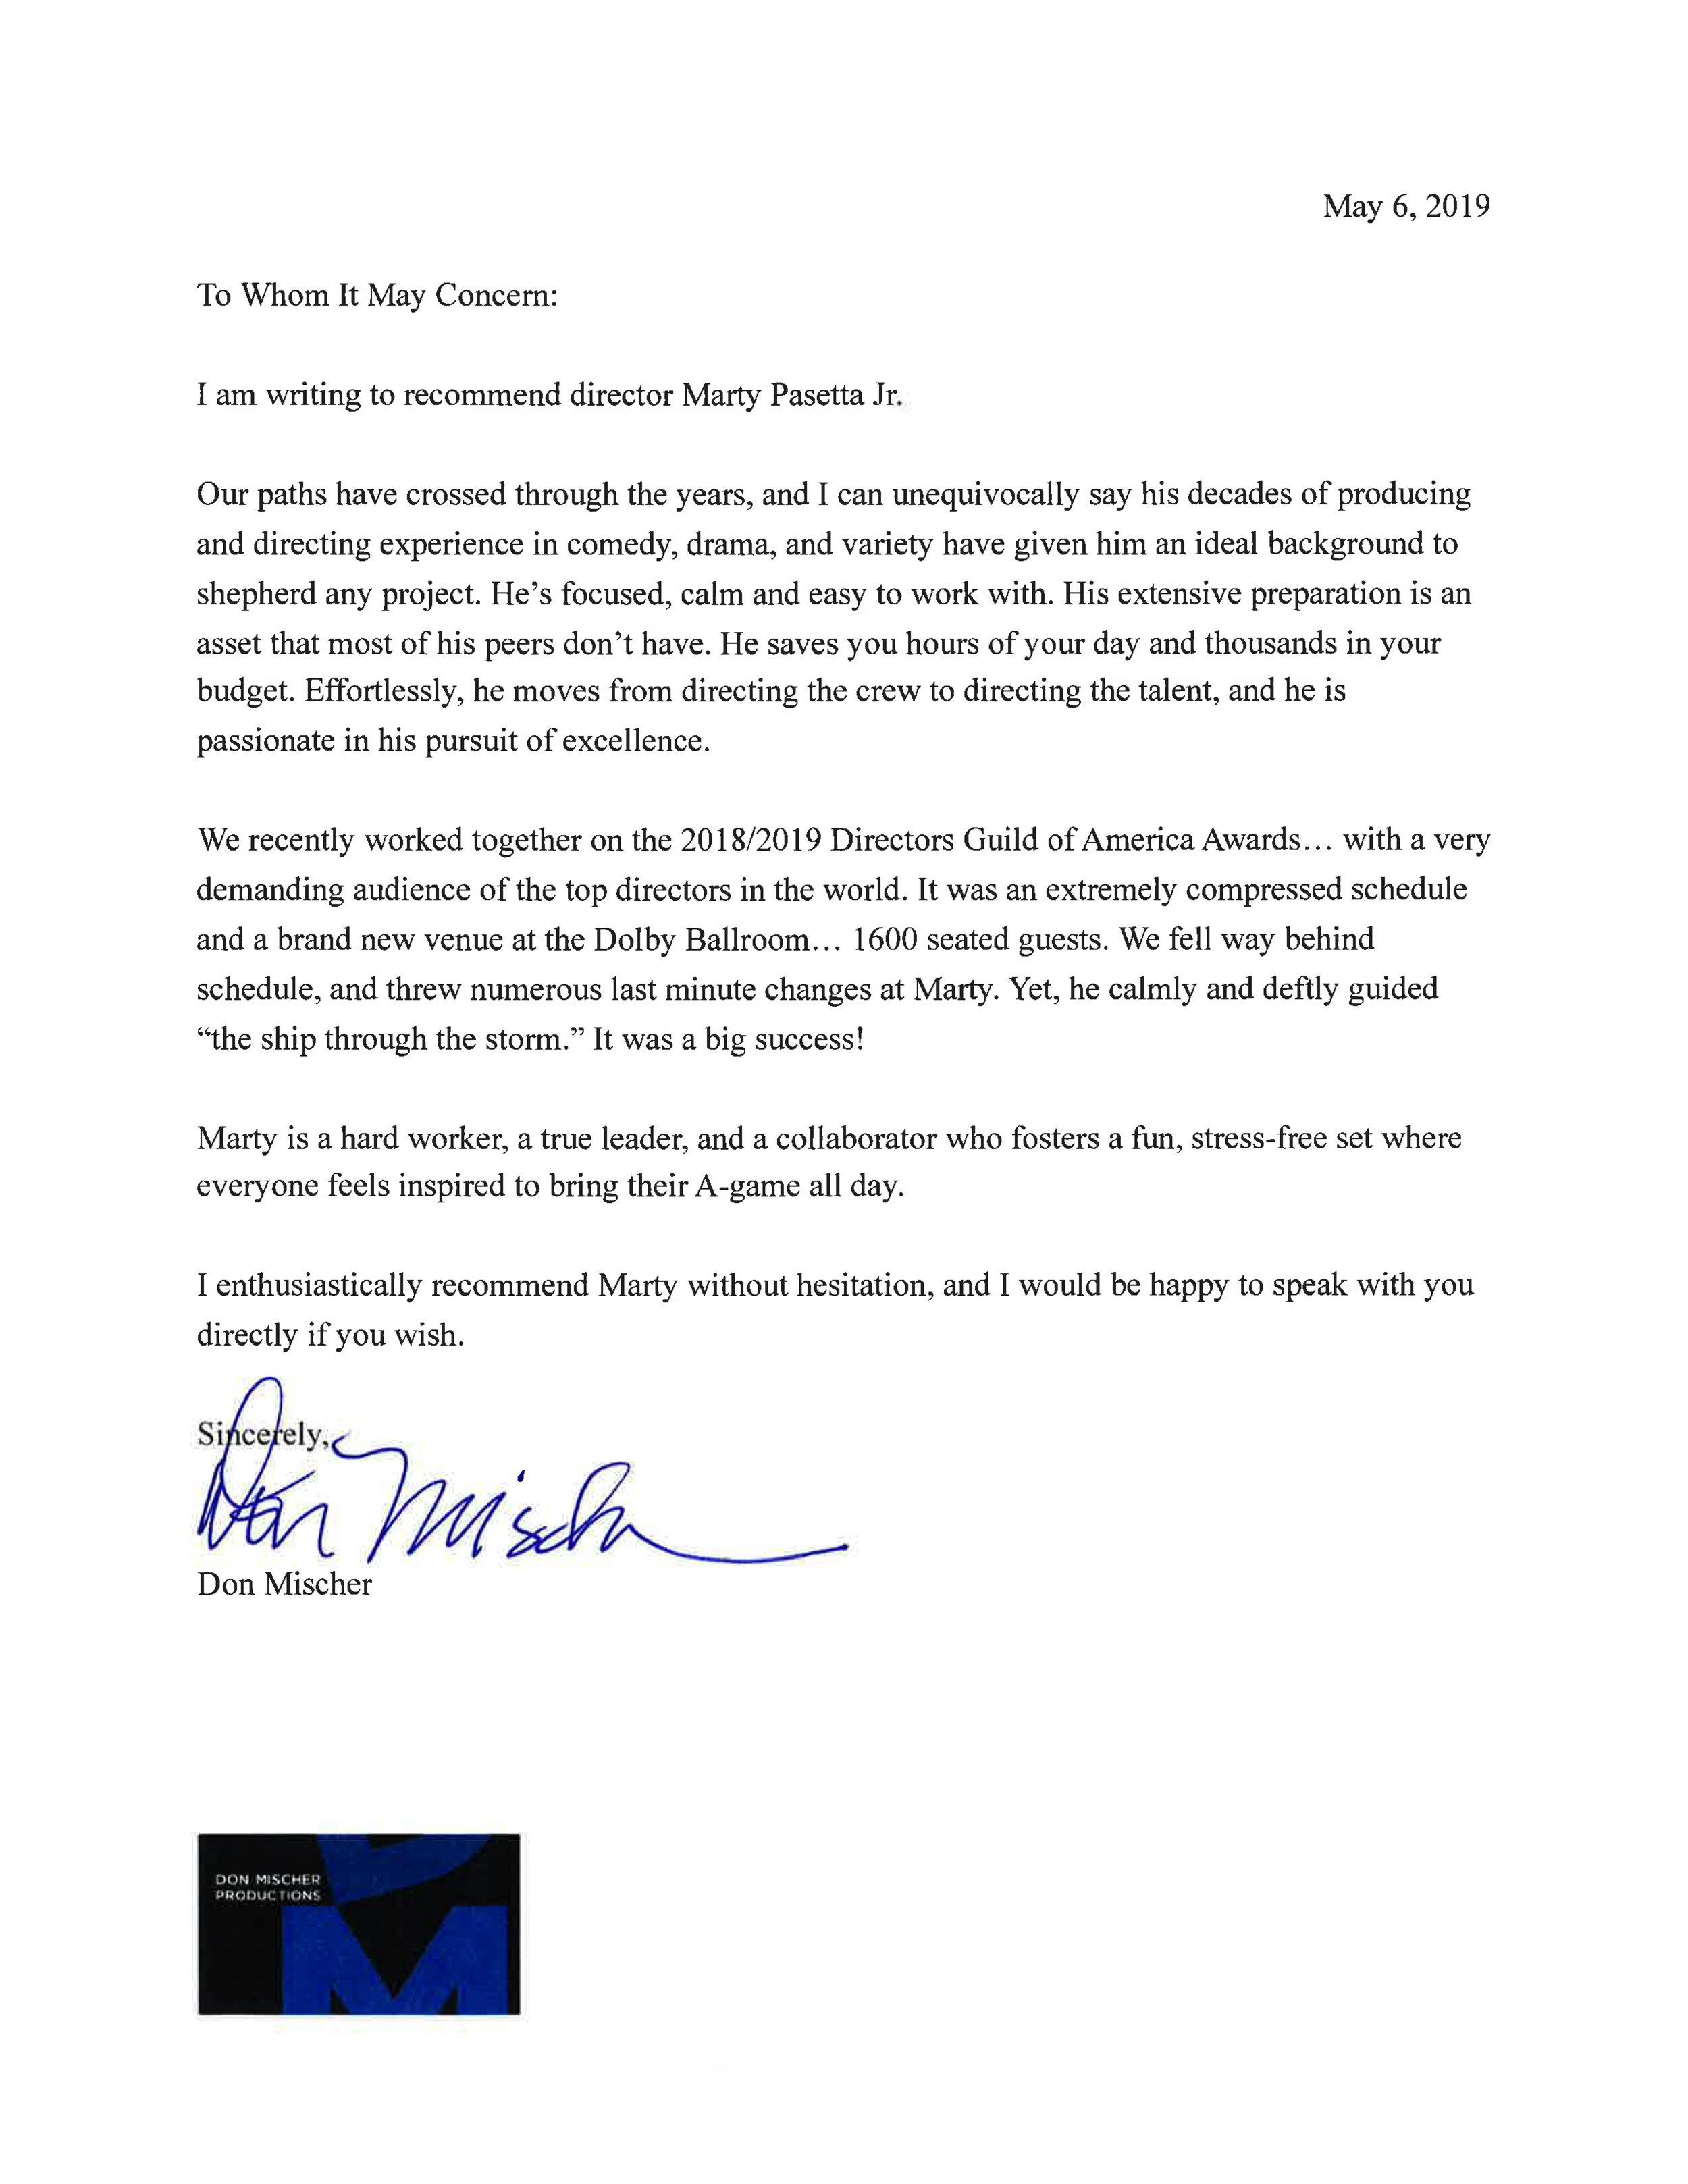 Don Mischer Letter.jpg